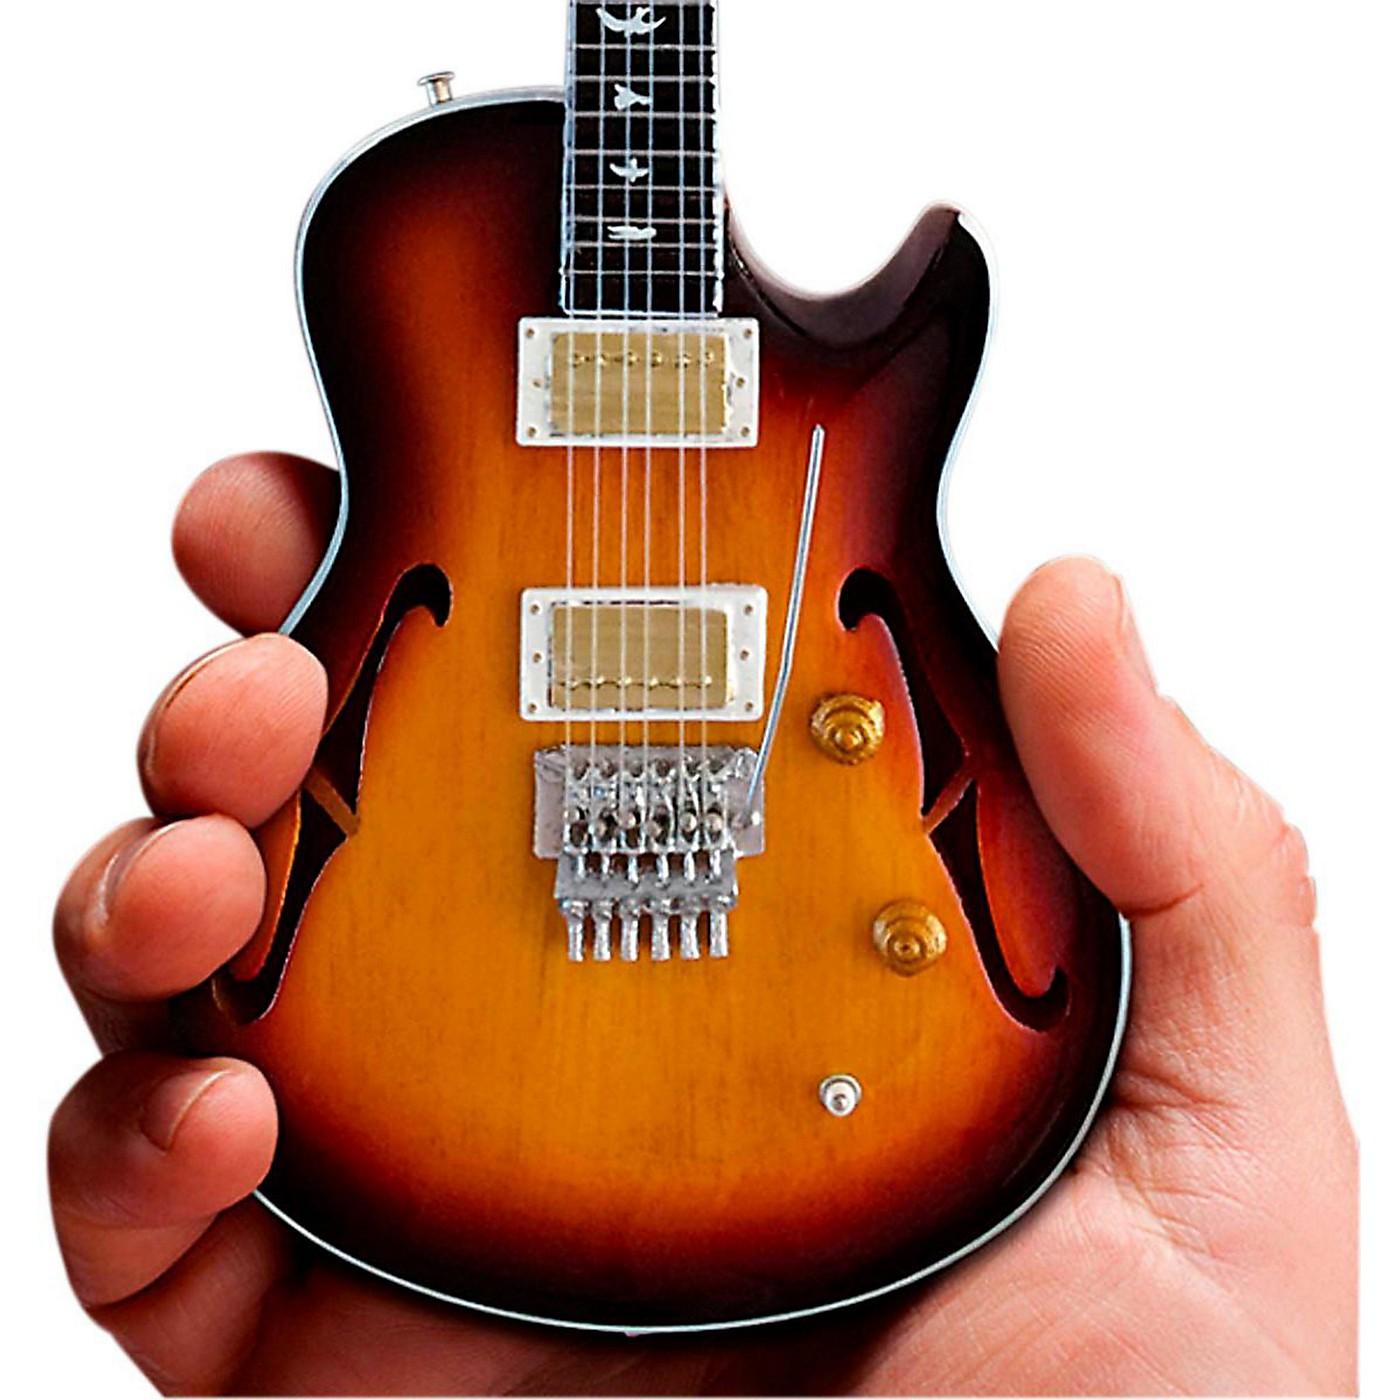 Axe Heaven Neal Schon Sunburst NS-15 PRS Miniature Guitar Replica Collectible thumbnail